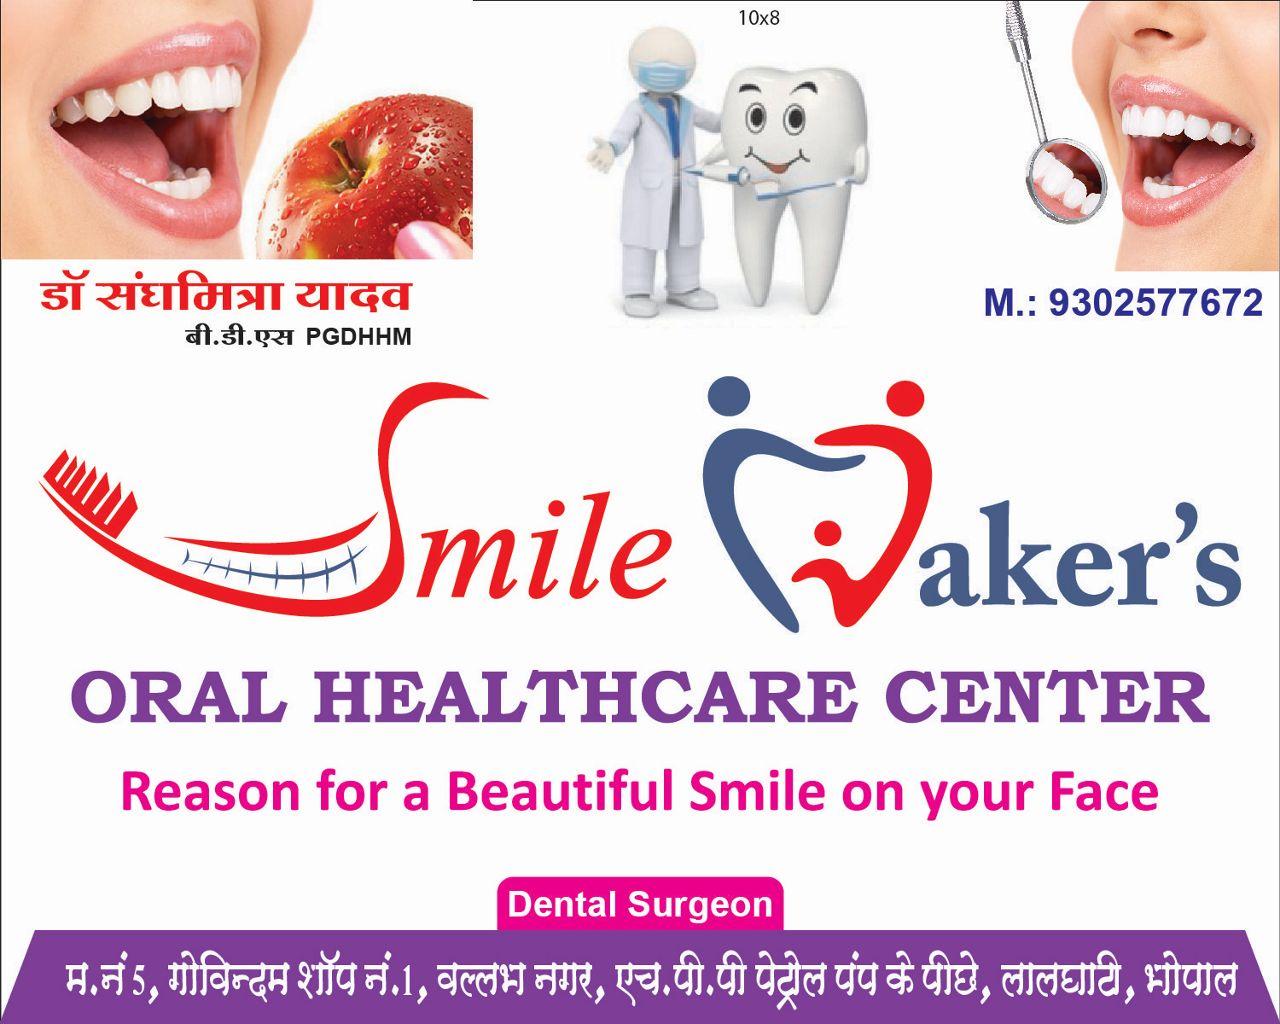 Smile Maker's Oral Healthcare Center &Tii center